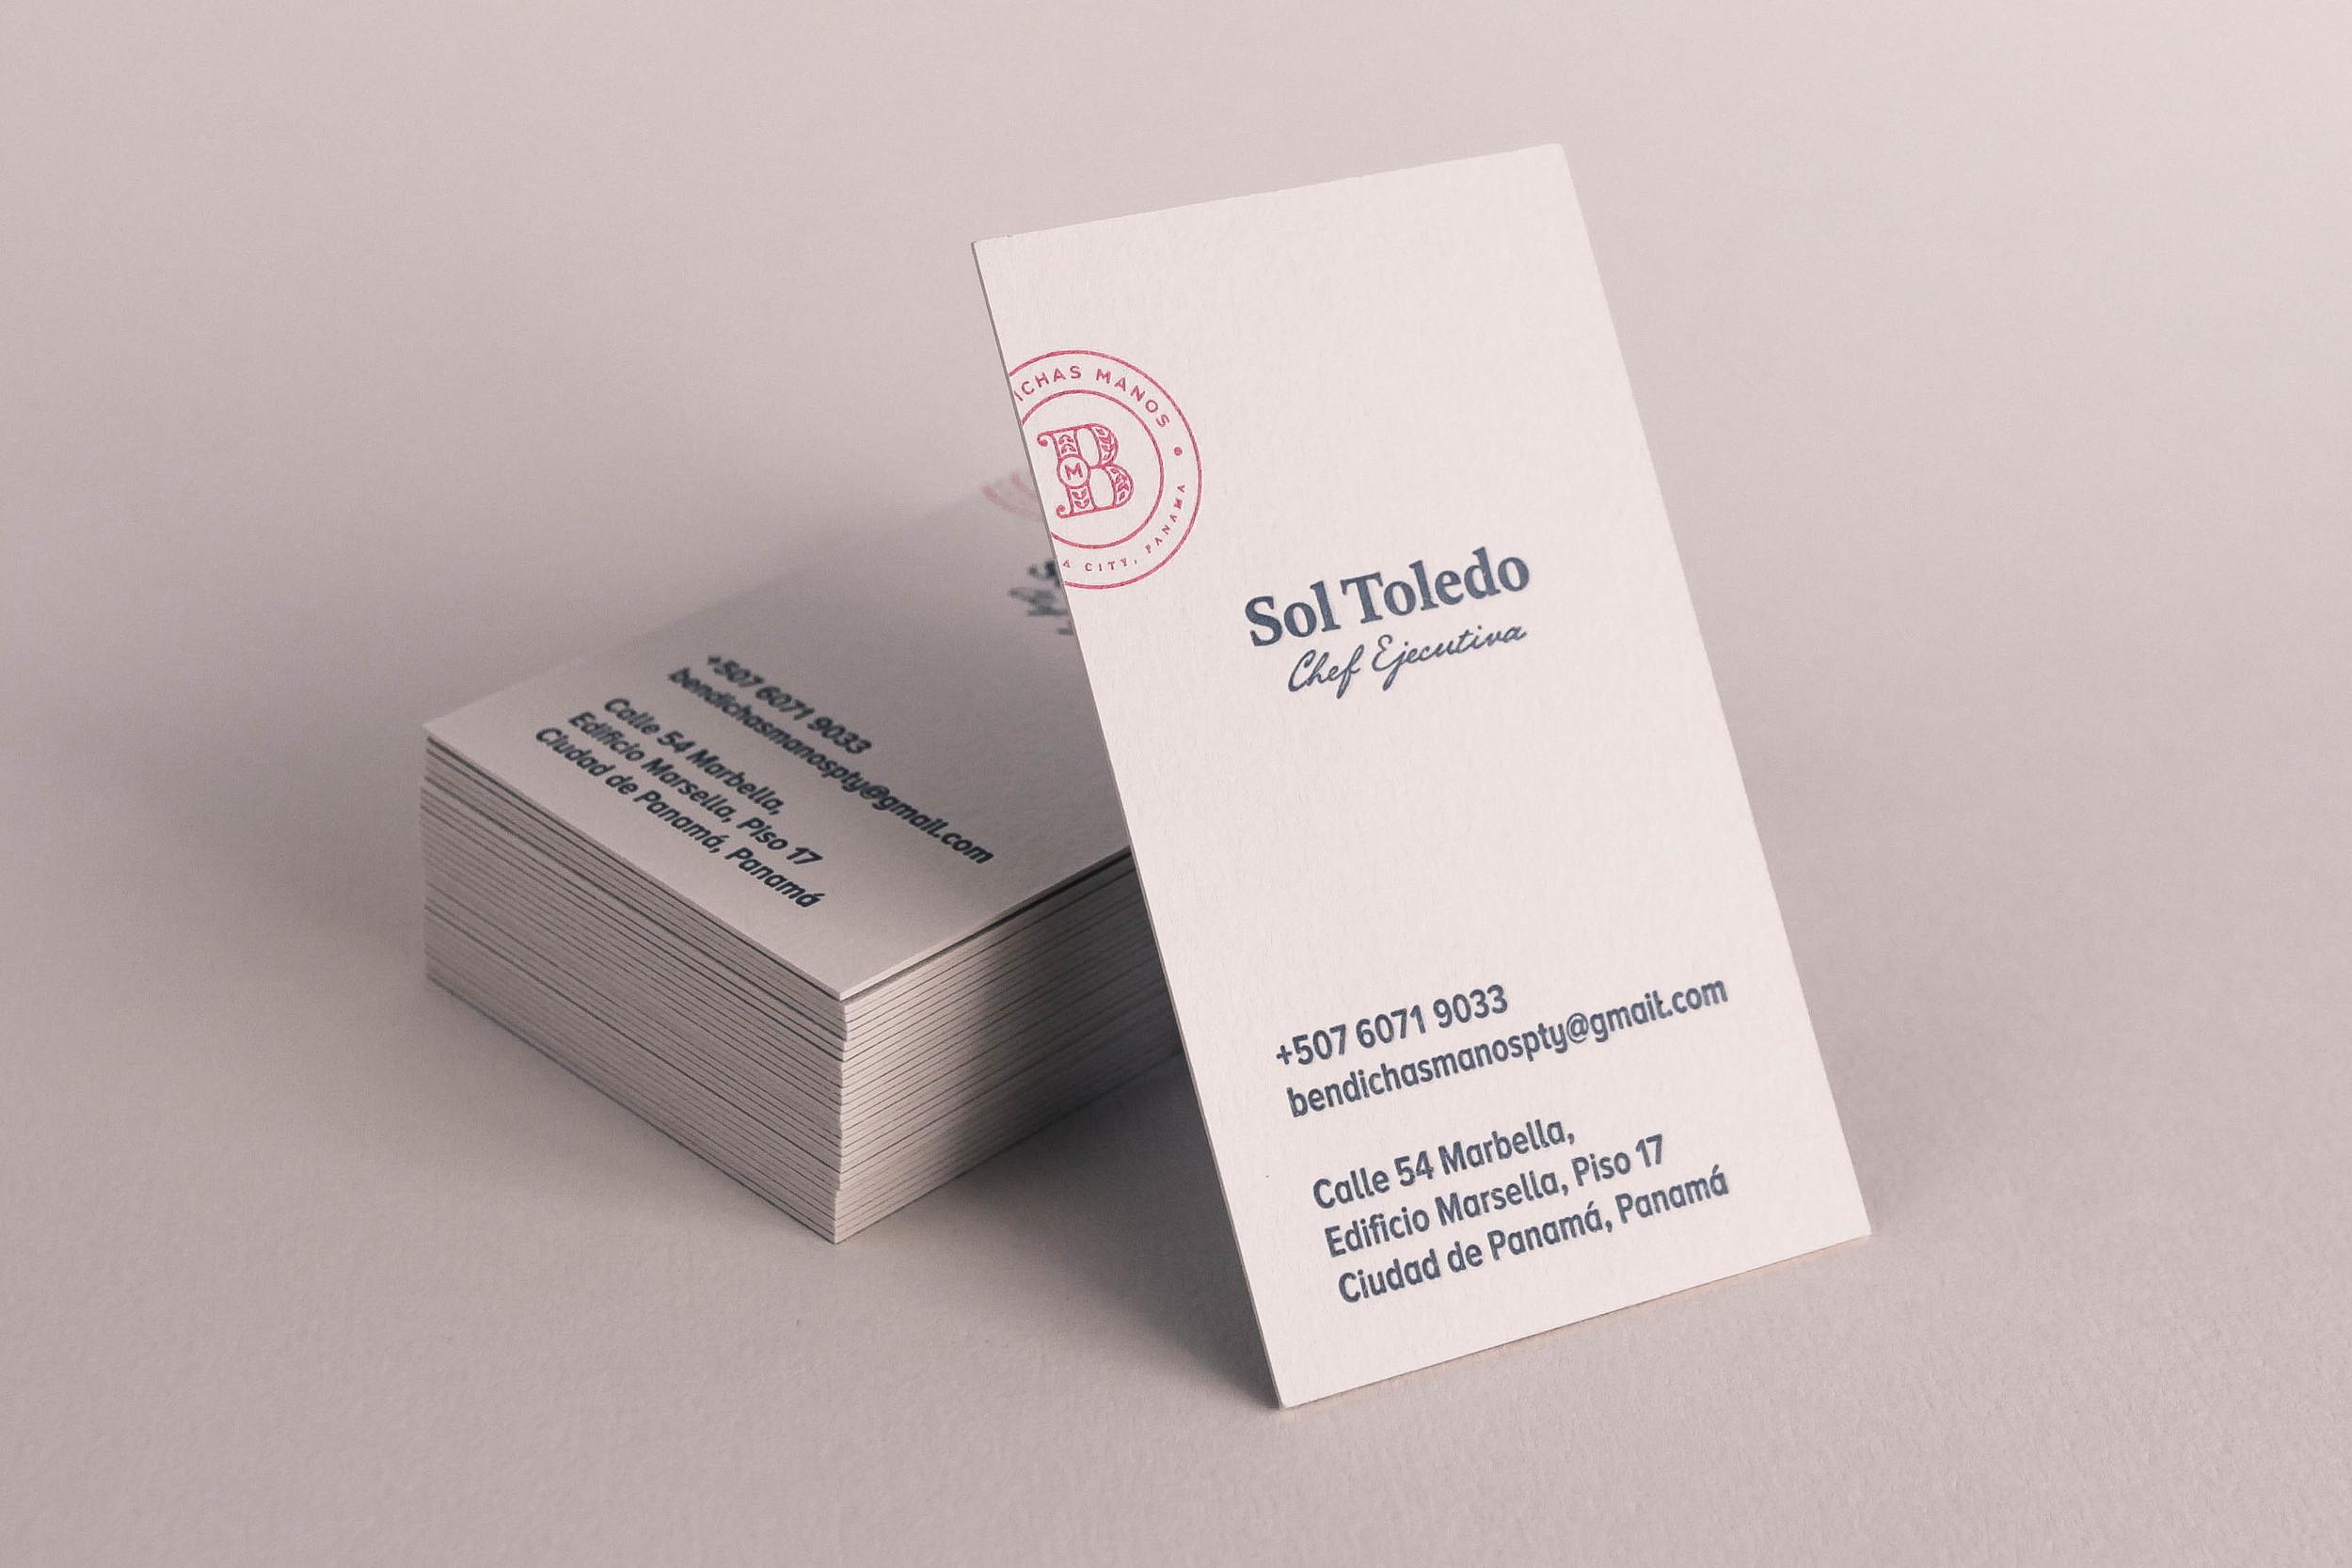 Digital and letterpress elements